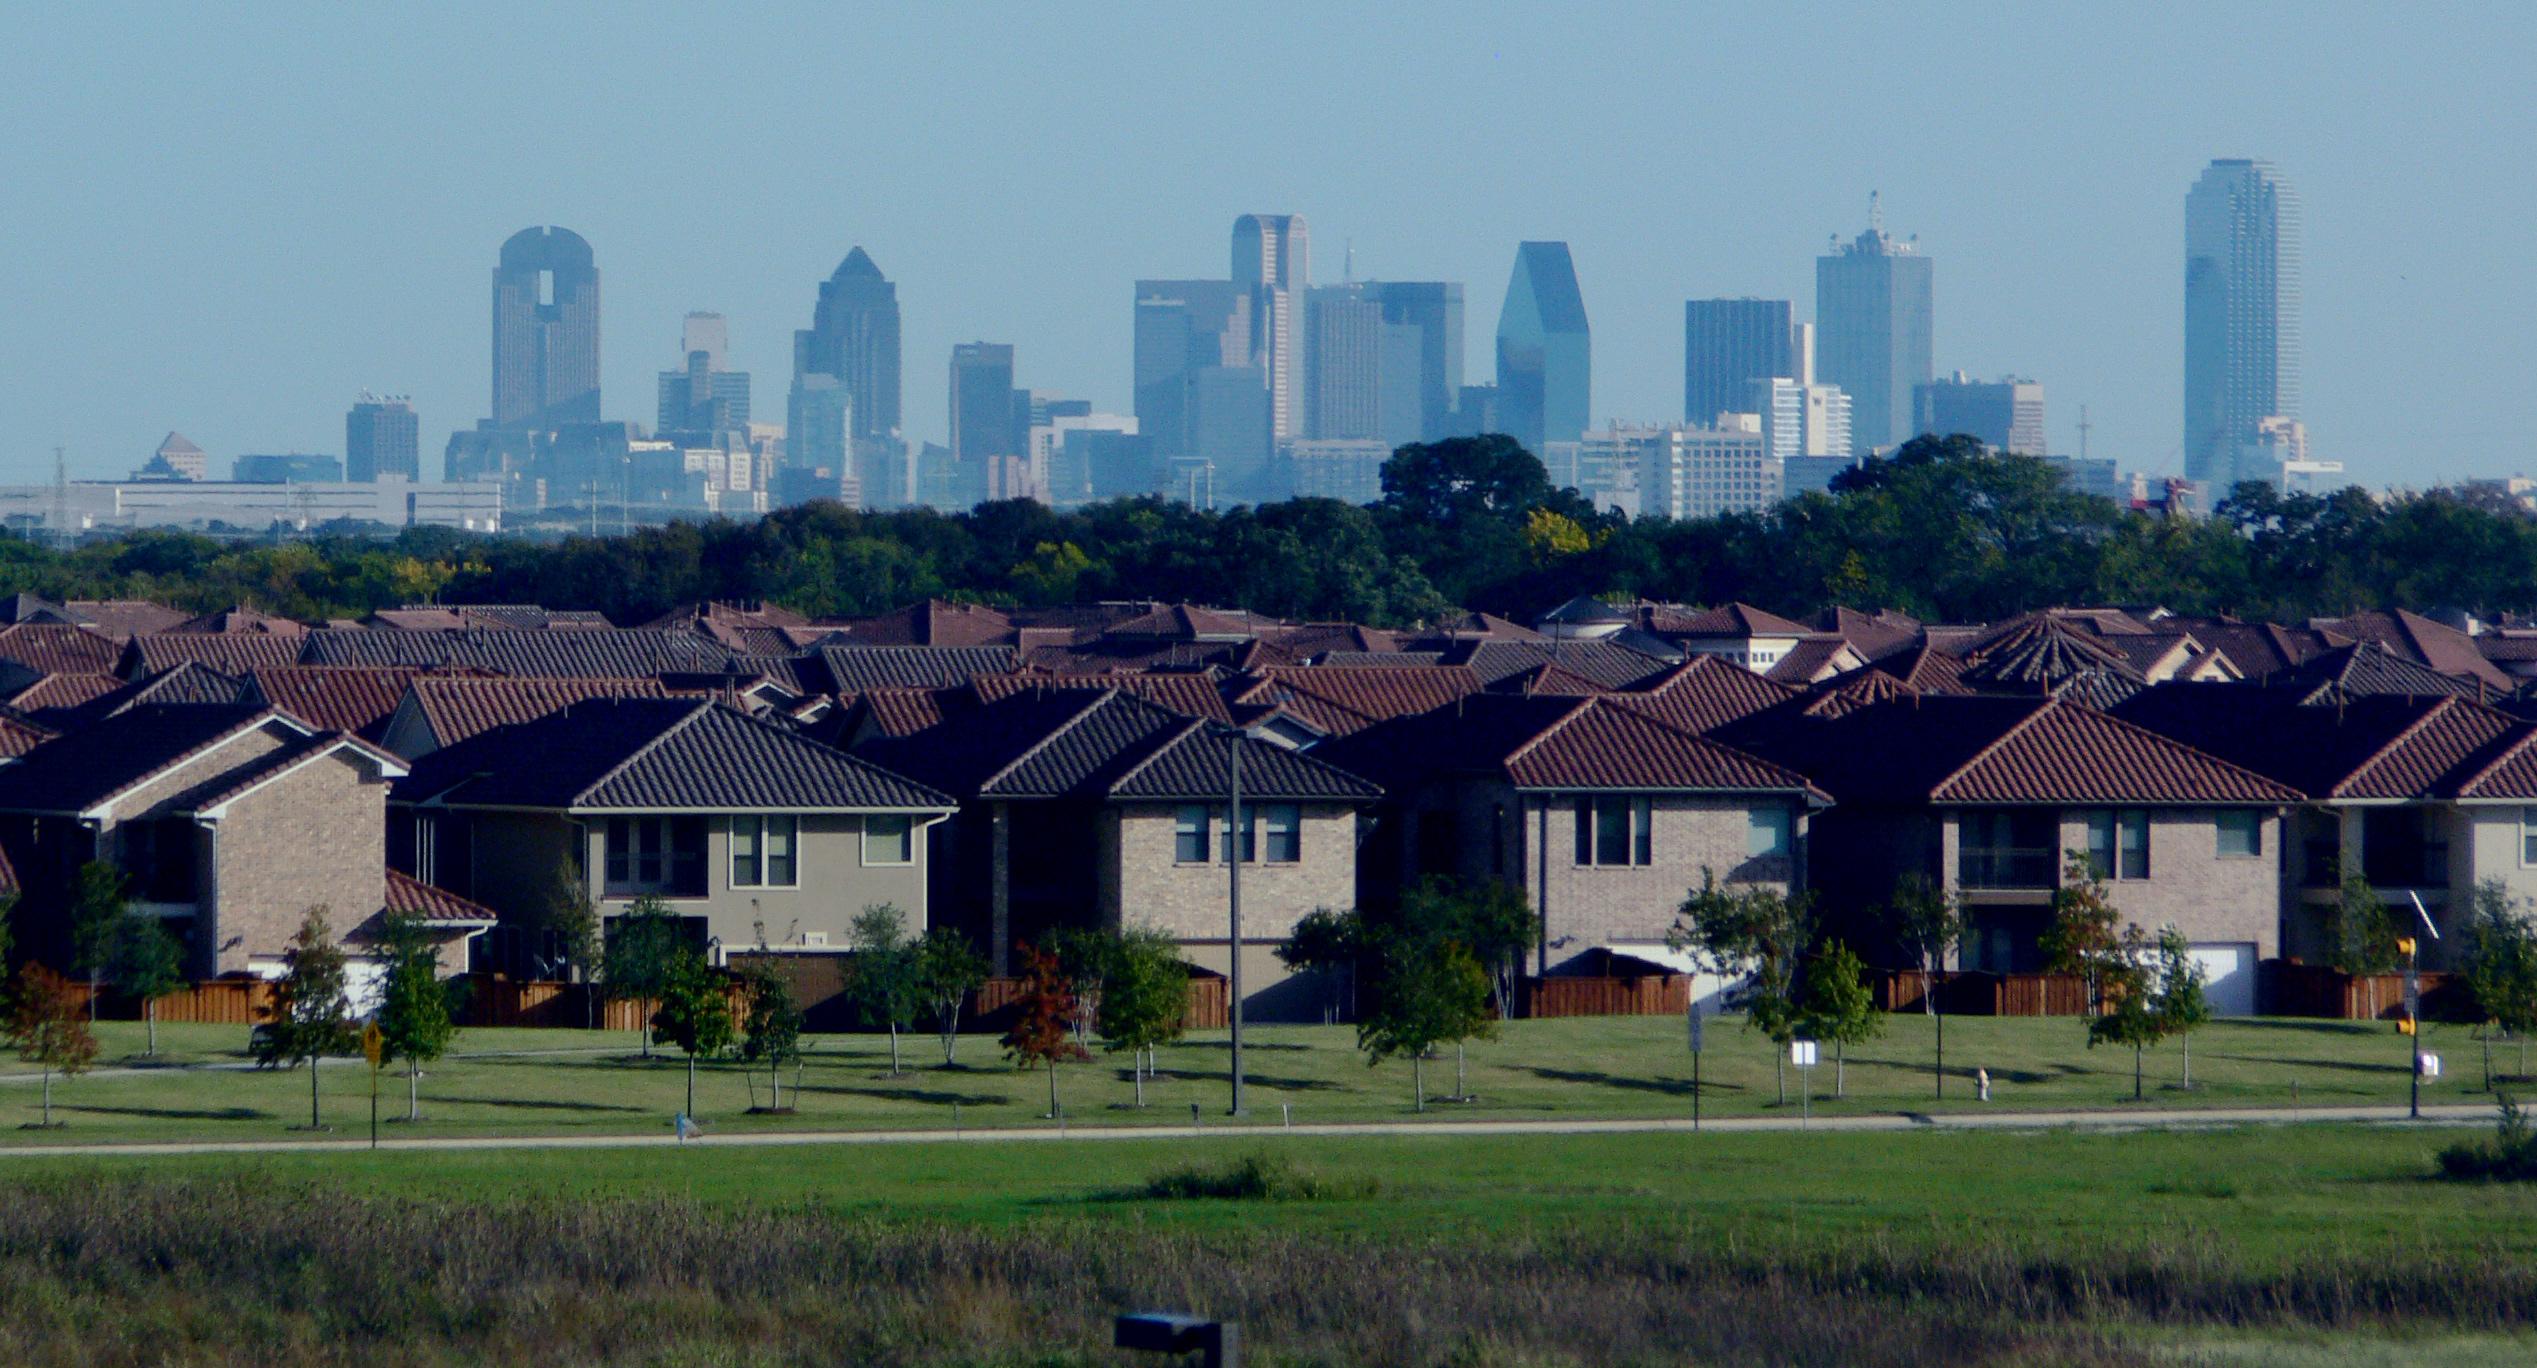 sub urbanization in america Population studies and urbanization read scientific research on the effects of urbanization and related research.